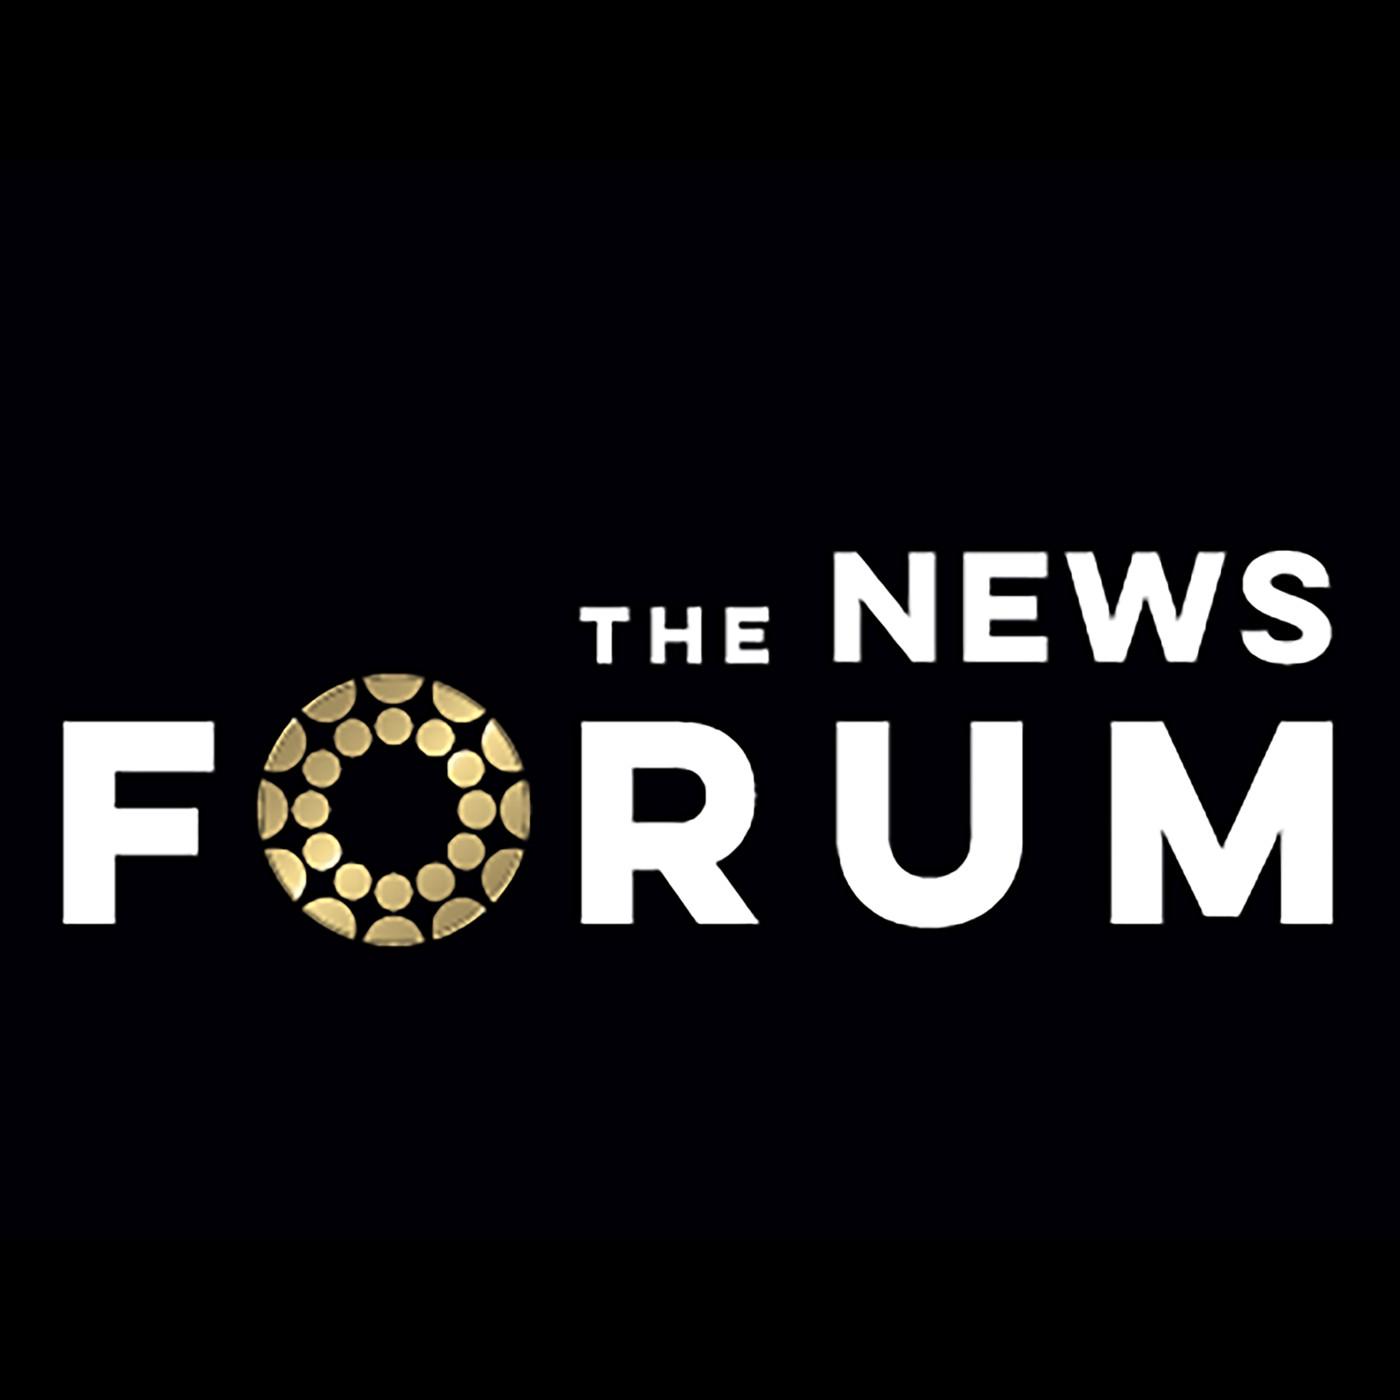 Tore Stautland, CEO of The News Forum